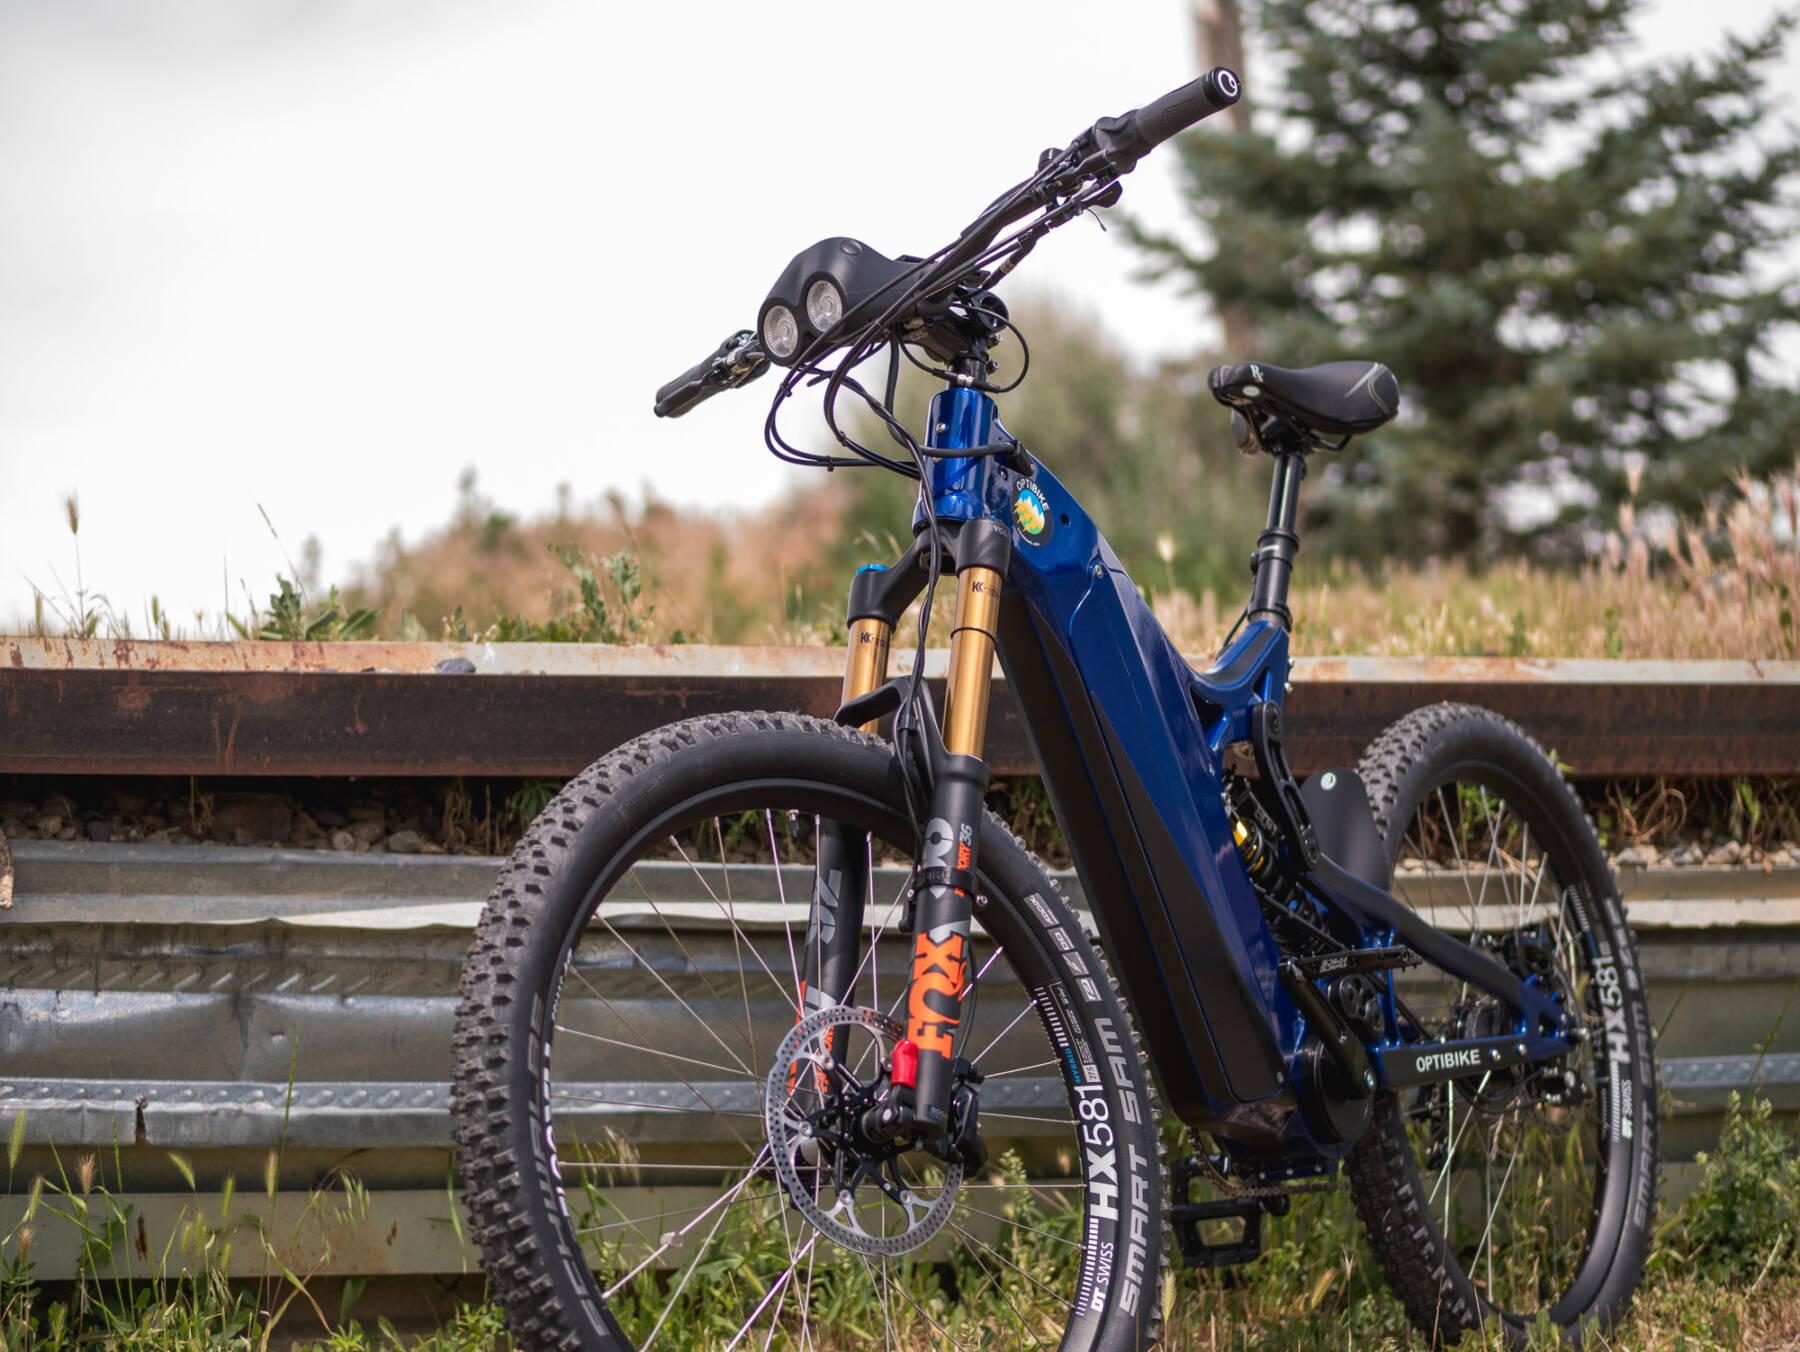 Optibike R15C High Performance eMTB E-Bike with Blue Paint